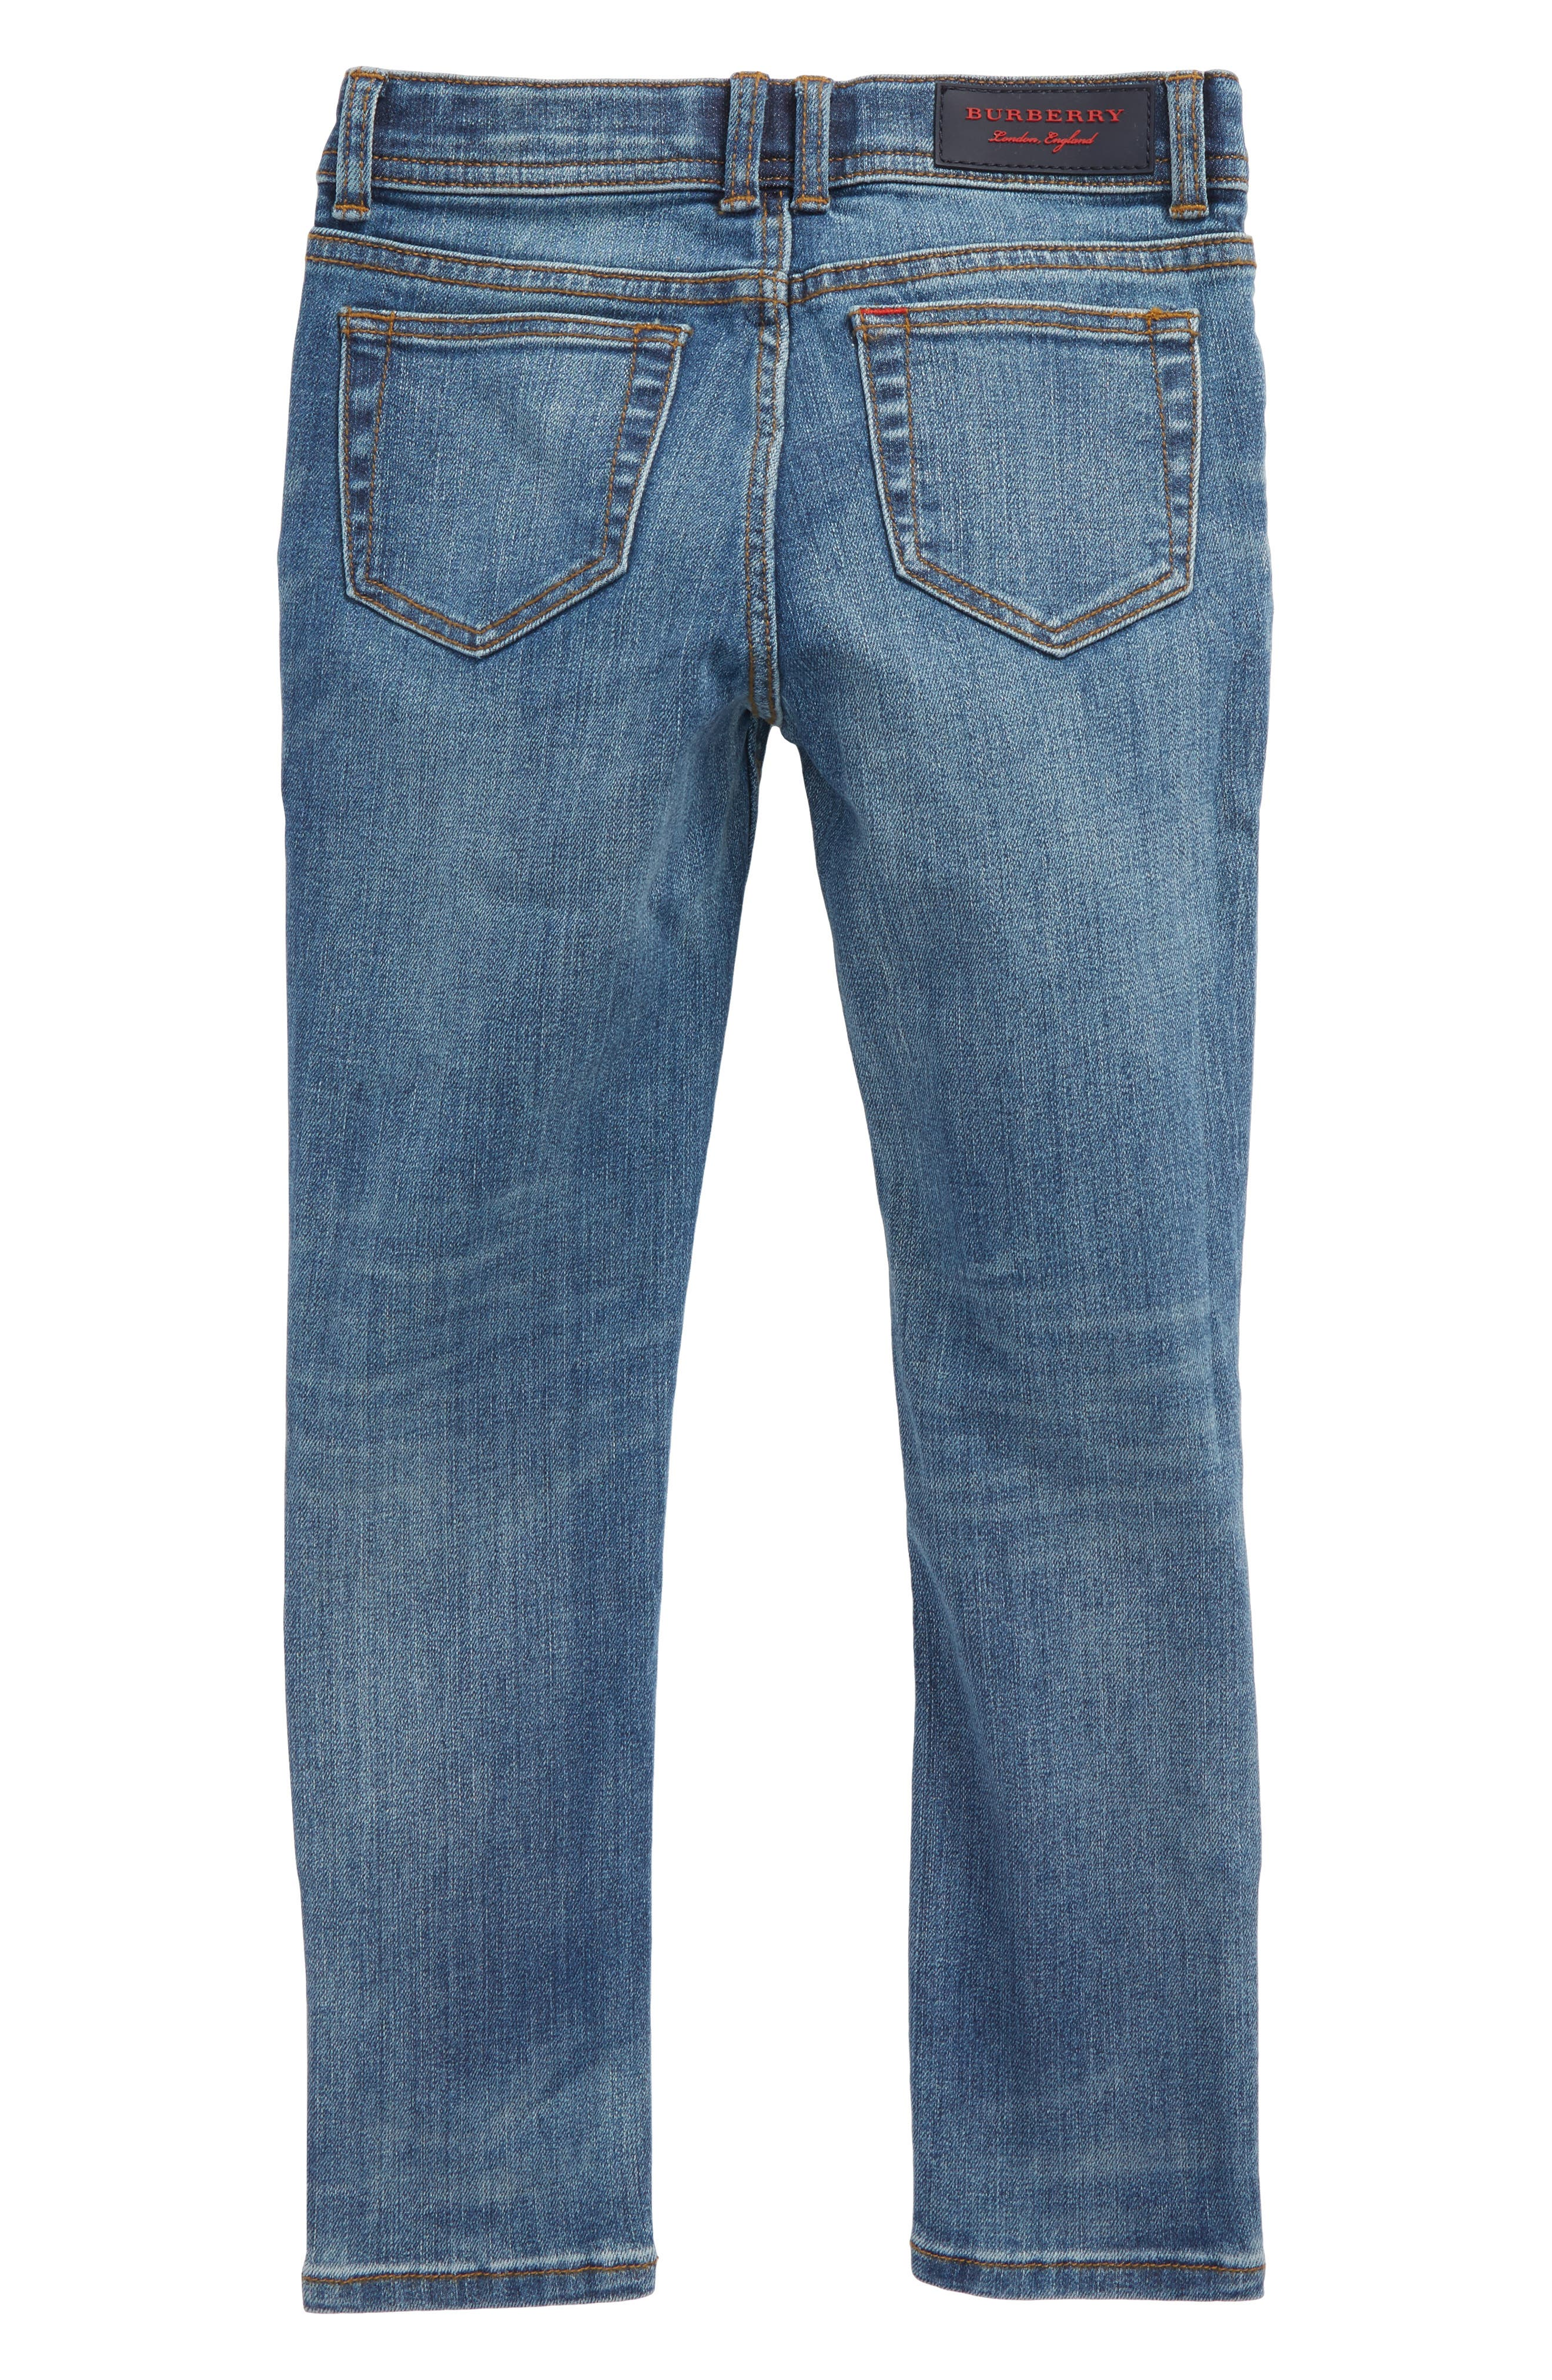 Skinny Jeans,                             Alternate thumbnail 2, color,                             MID INDIGO